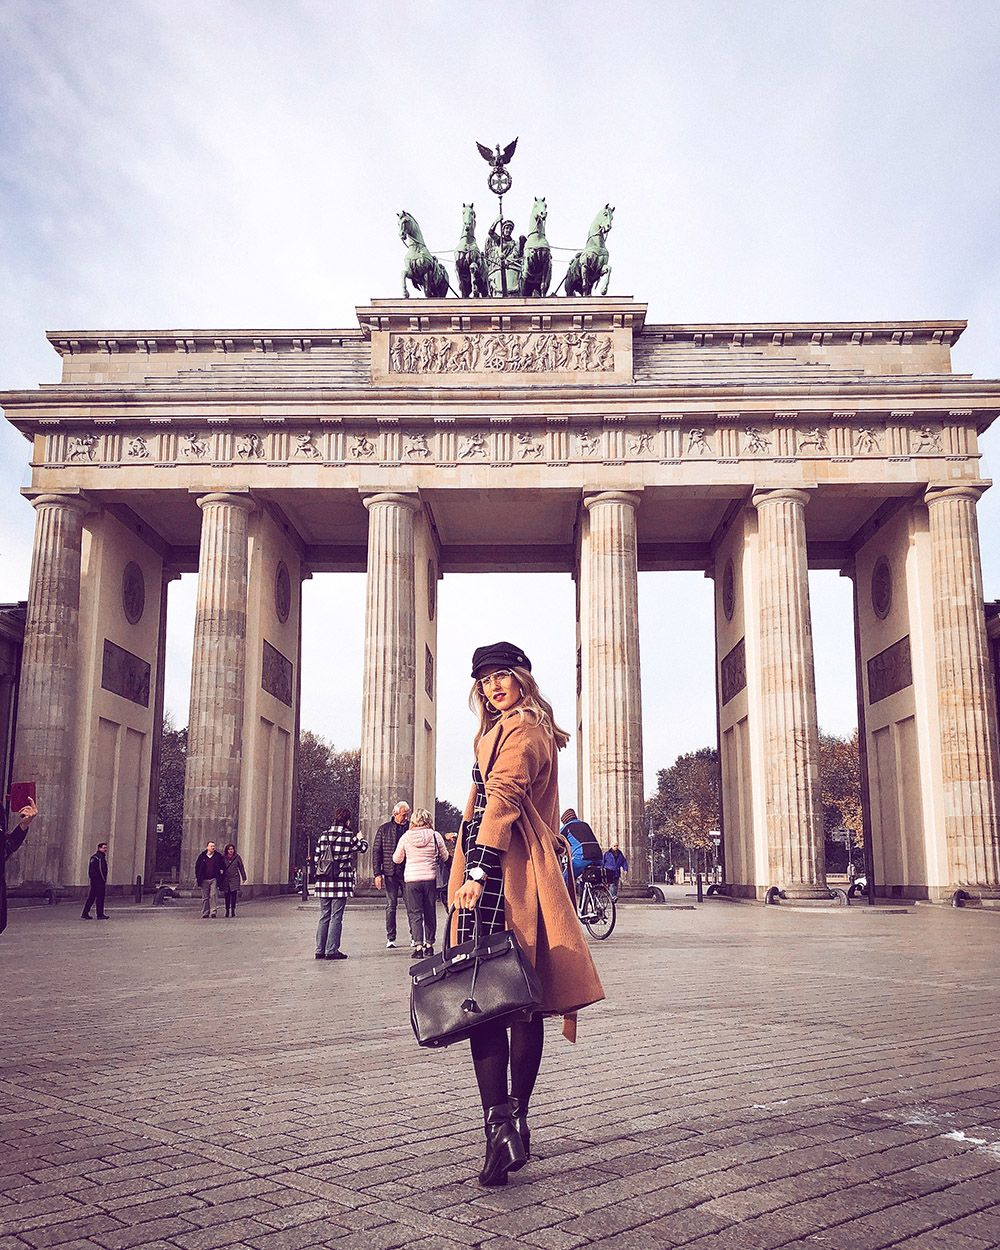 Berlin Guide Best Breakfast Brunch Fashion Spots Must See Places Berlin Travel Photography Berlin Travel Berlin Photography